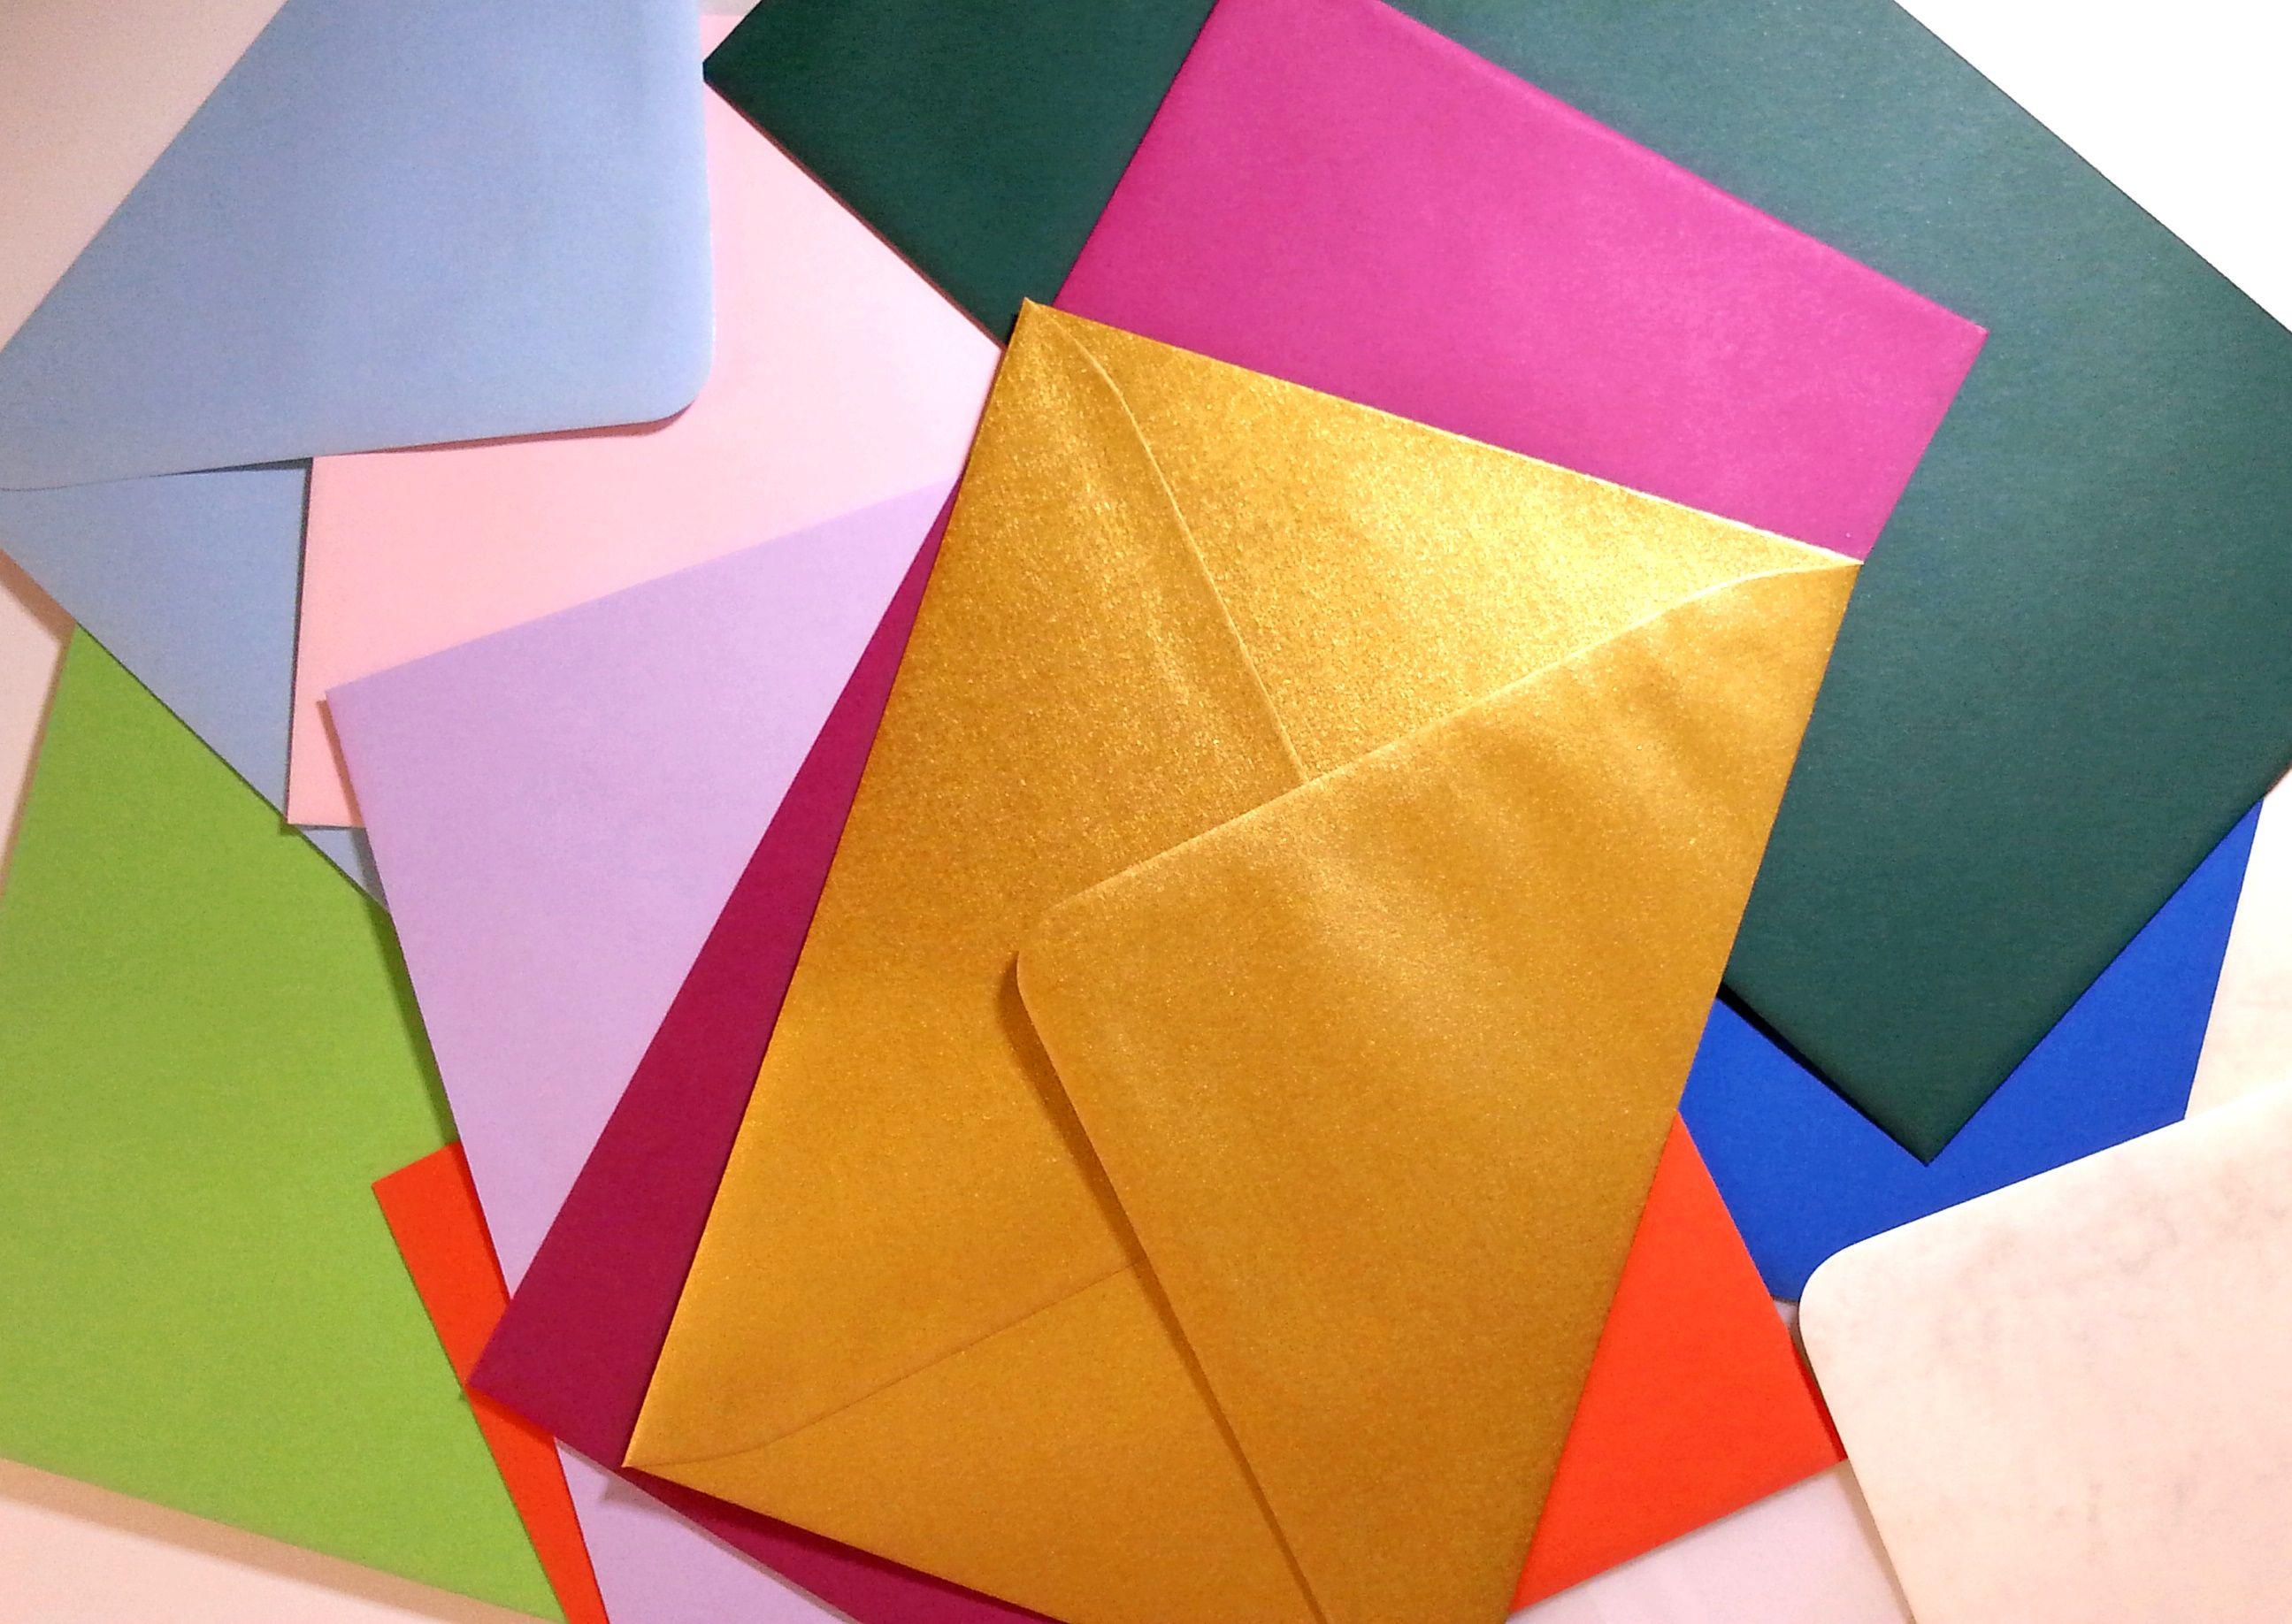 www.Kuvertwelt.de ... tolle farbige Kuverts entdeckt! Der GOLDENE hat es mir besonders angetan ;)